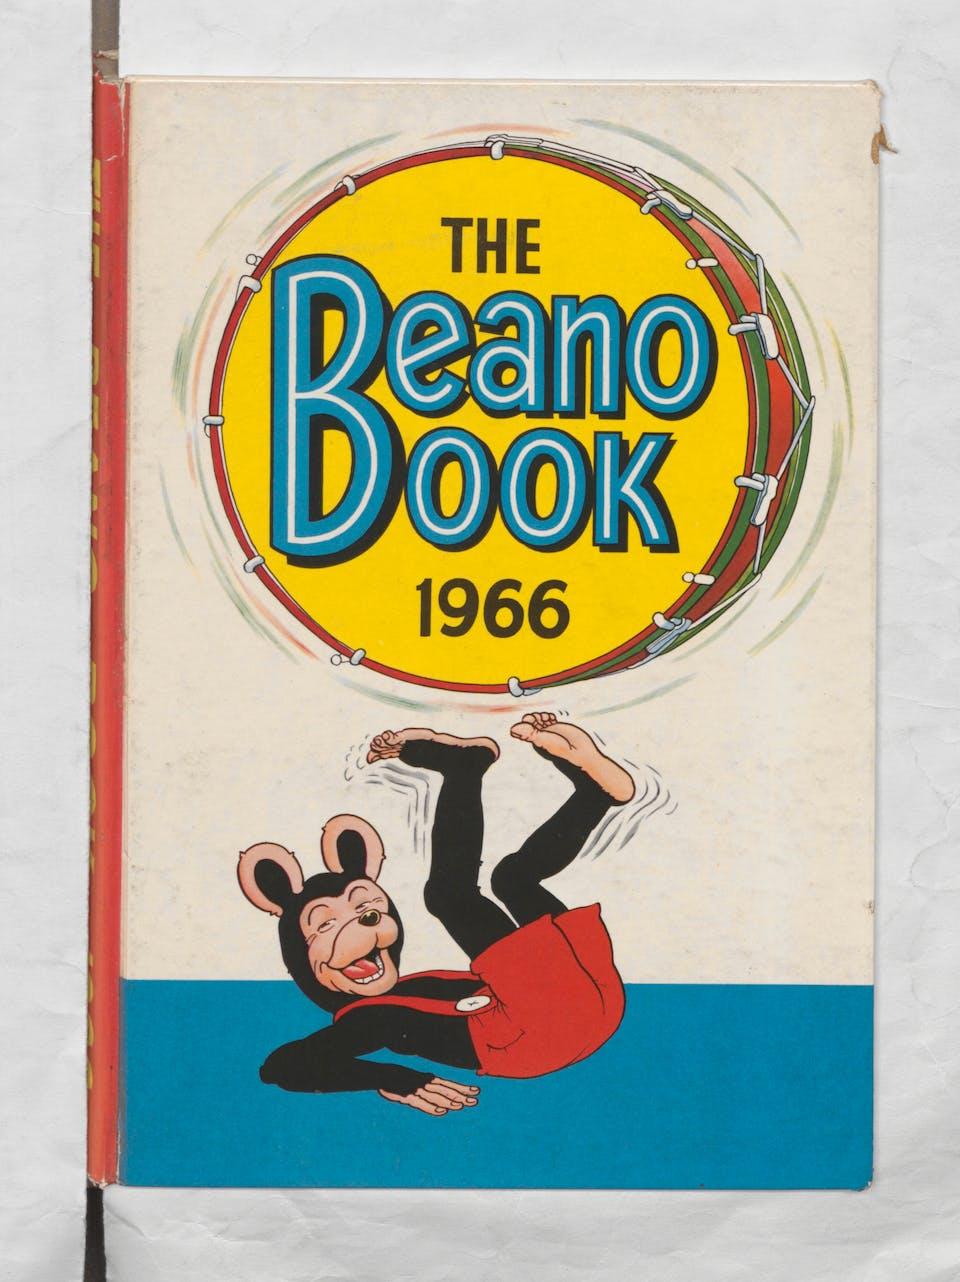 Biffo - Beano Book 1966